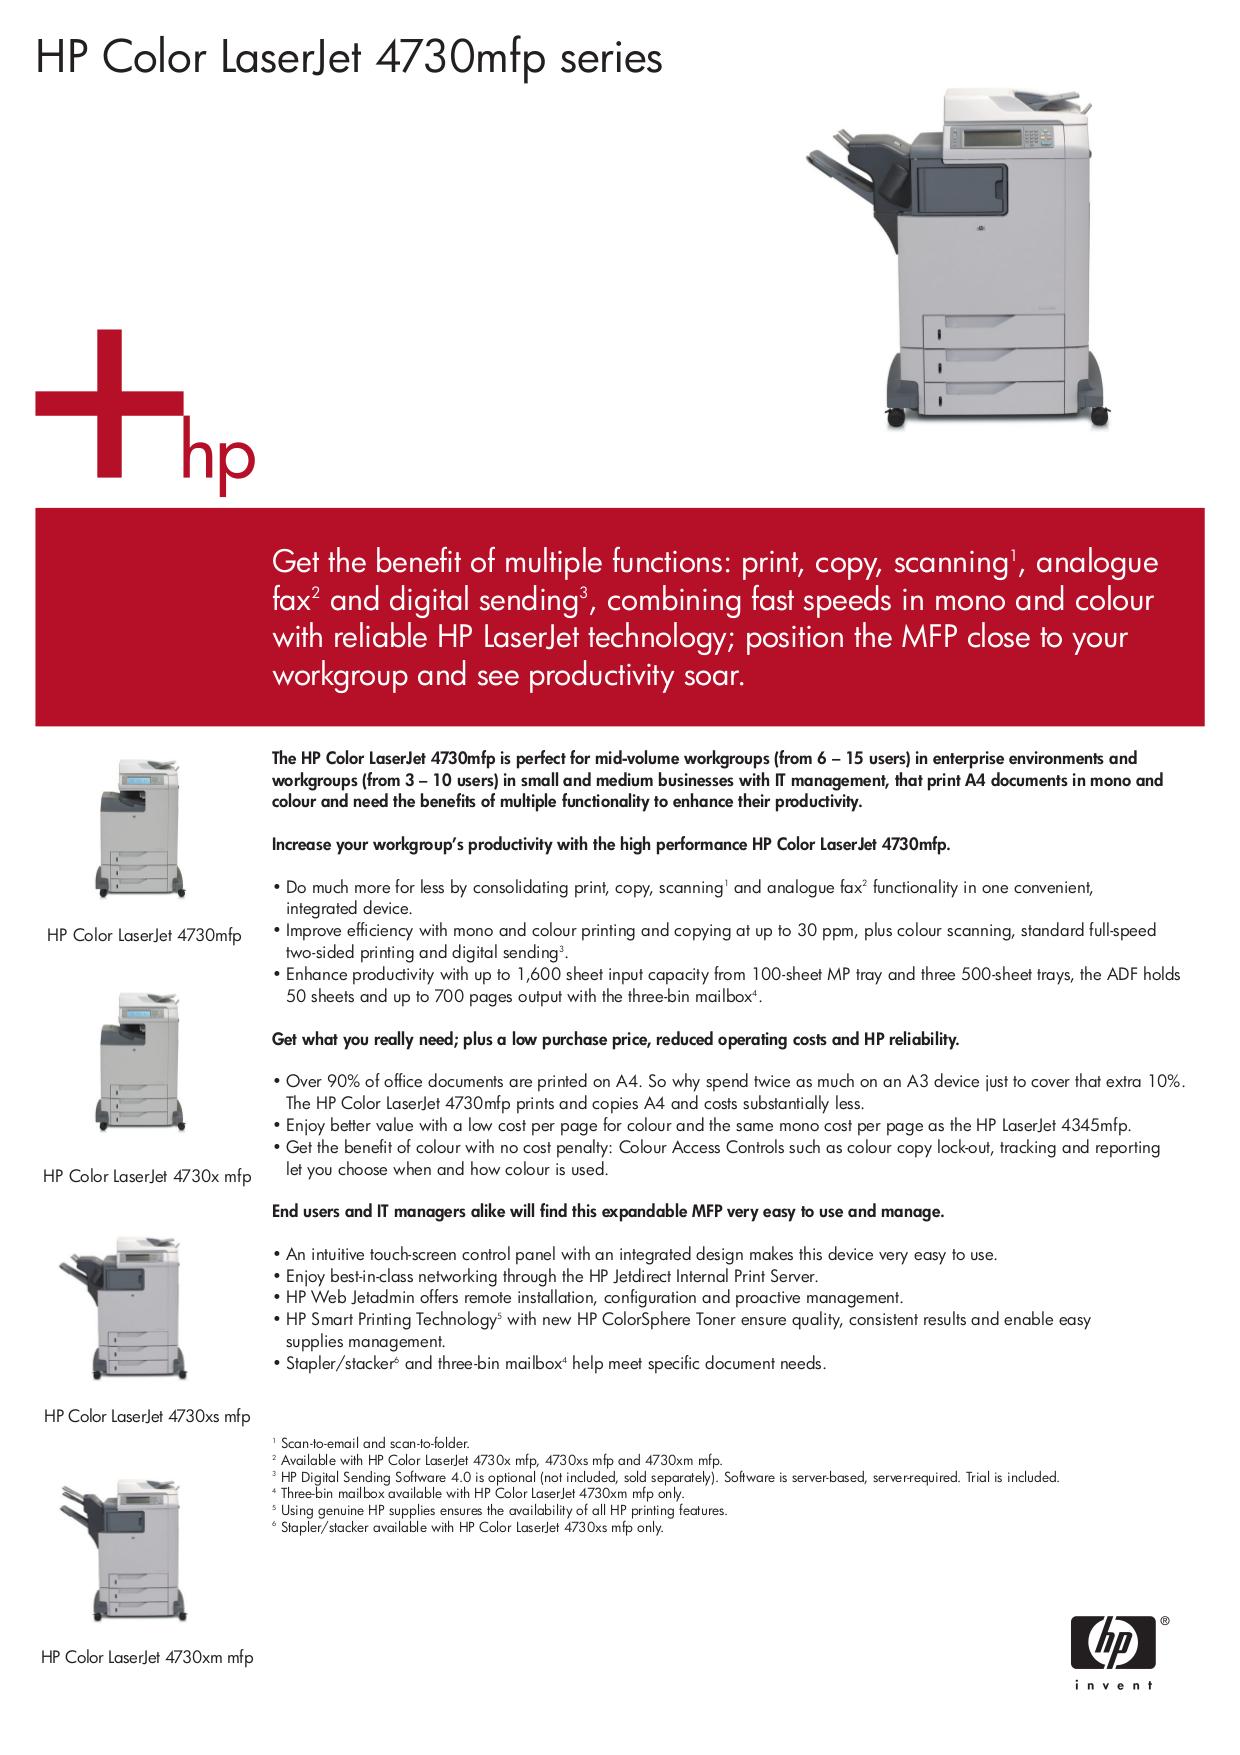 pdf for HP Multifunction Printer Laserjet,Color Laserjet 4730 MFP manual